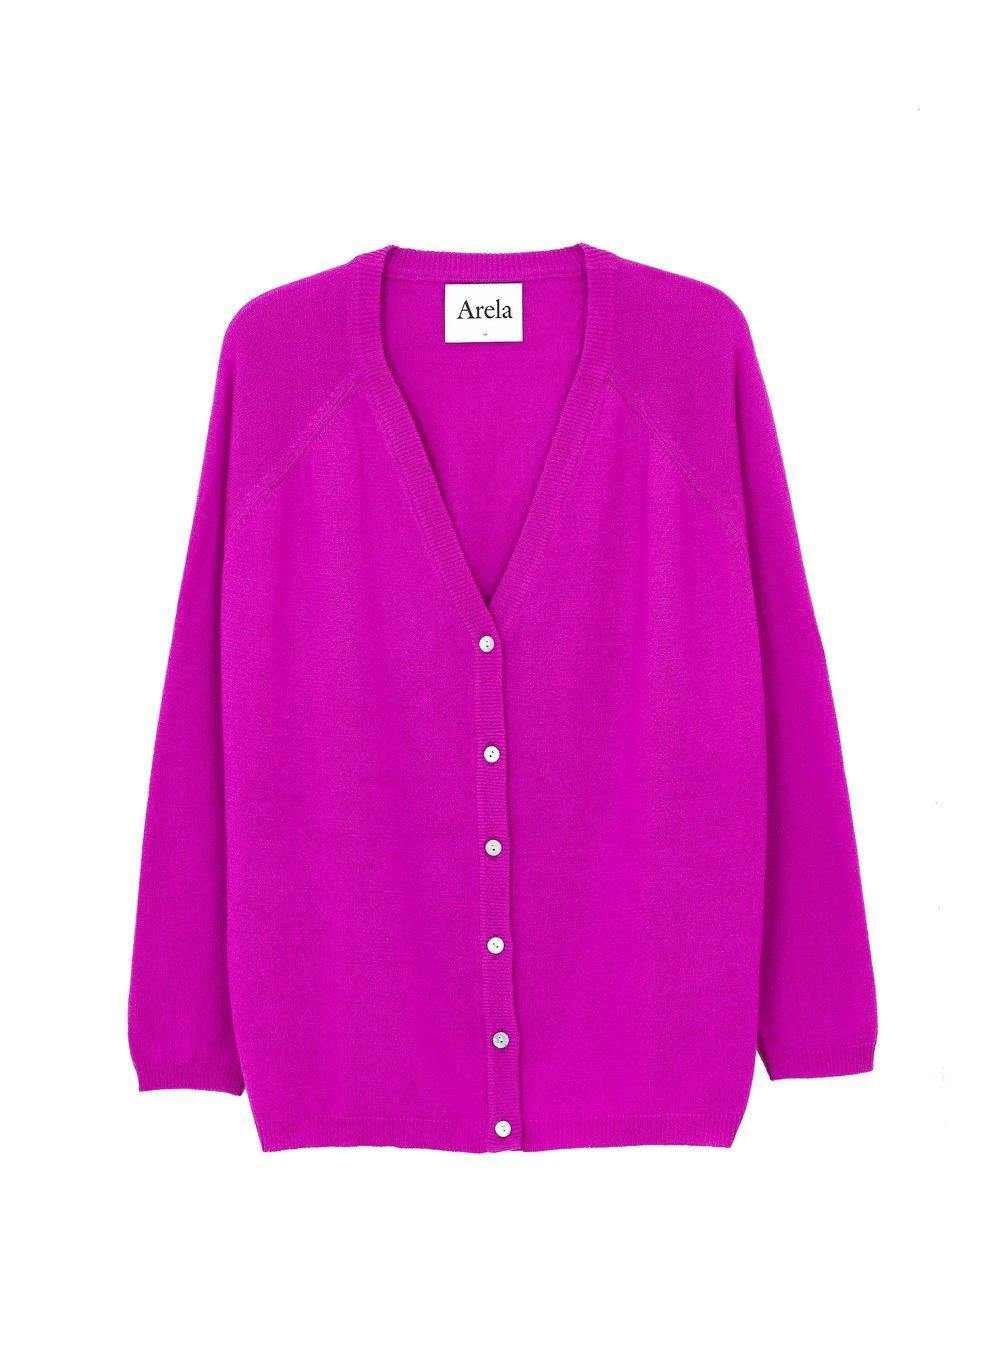 ARELA Jill Cardigan In Bright Pink